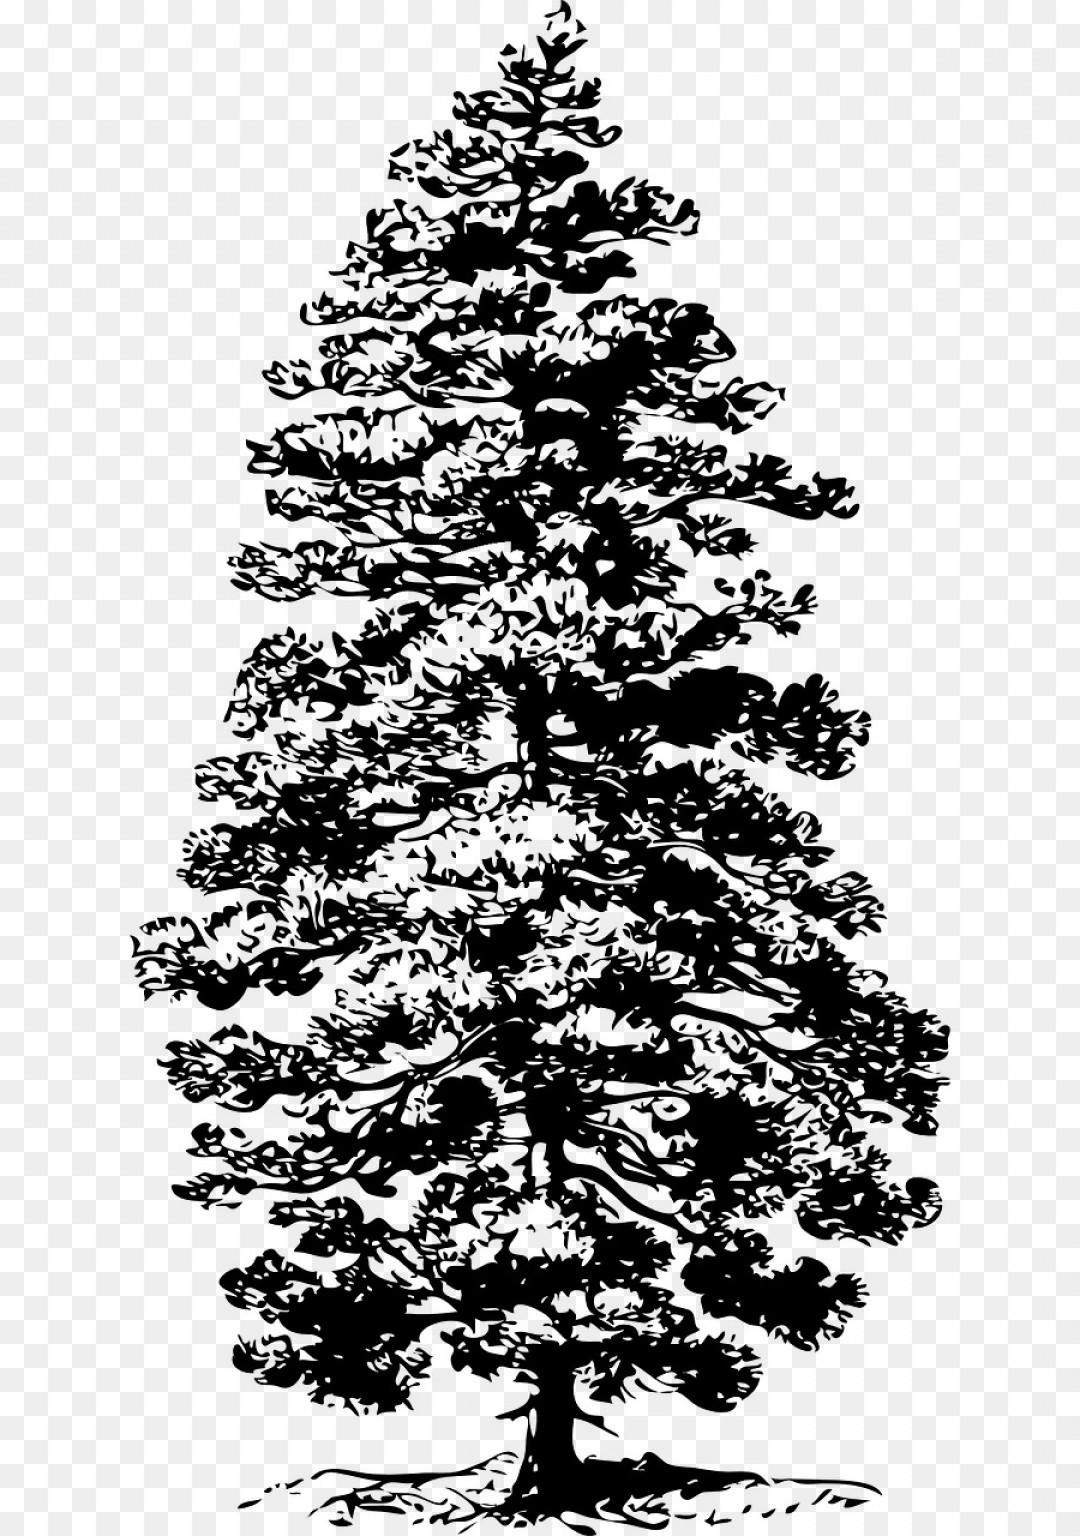 Eastern white pine clipart picture transparent download Png Eastern White Pine Tree Fir Clip Art Coniferous Ve   SOIDERGI picture transparent download